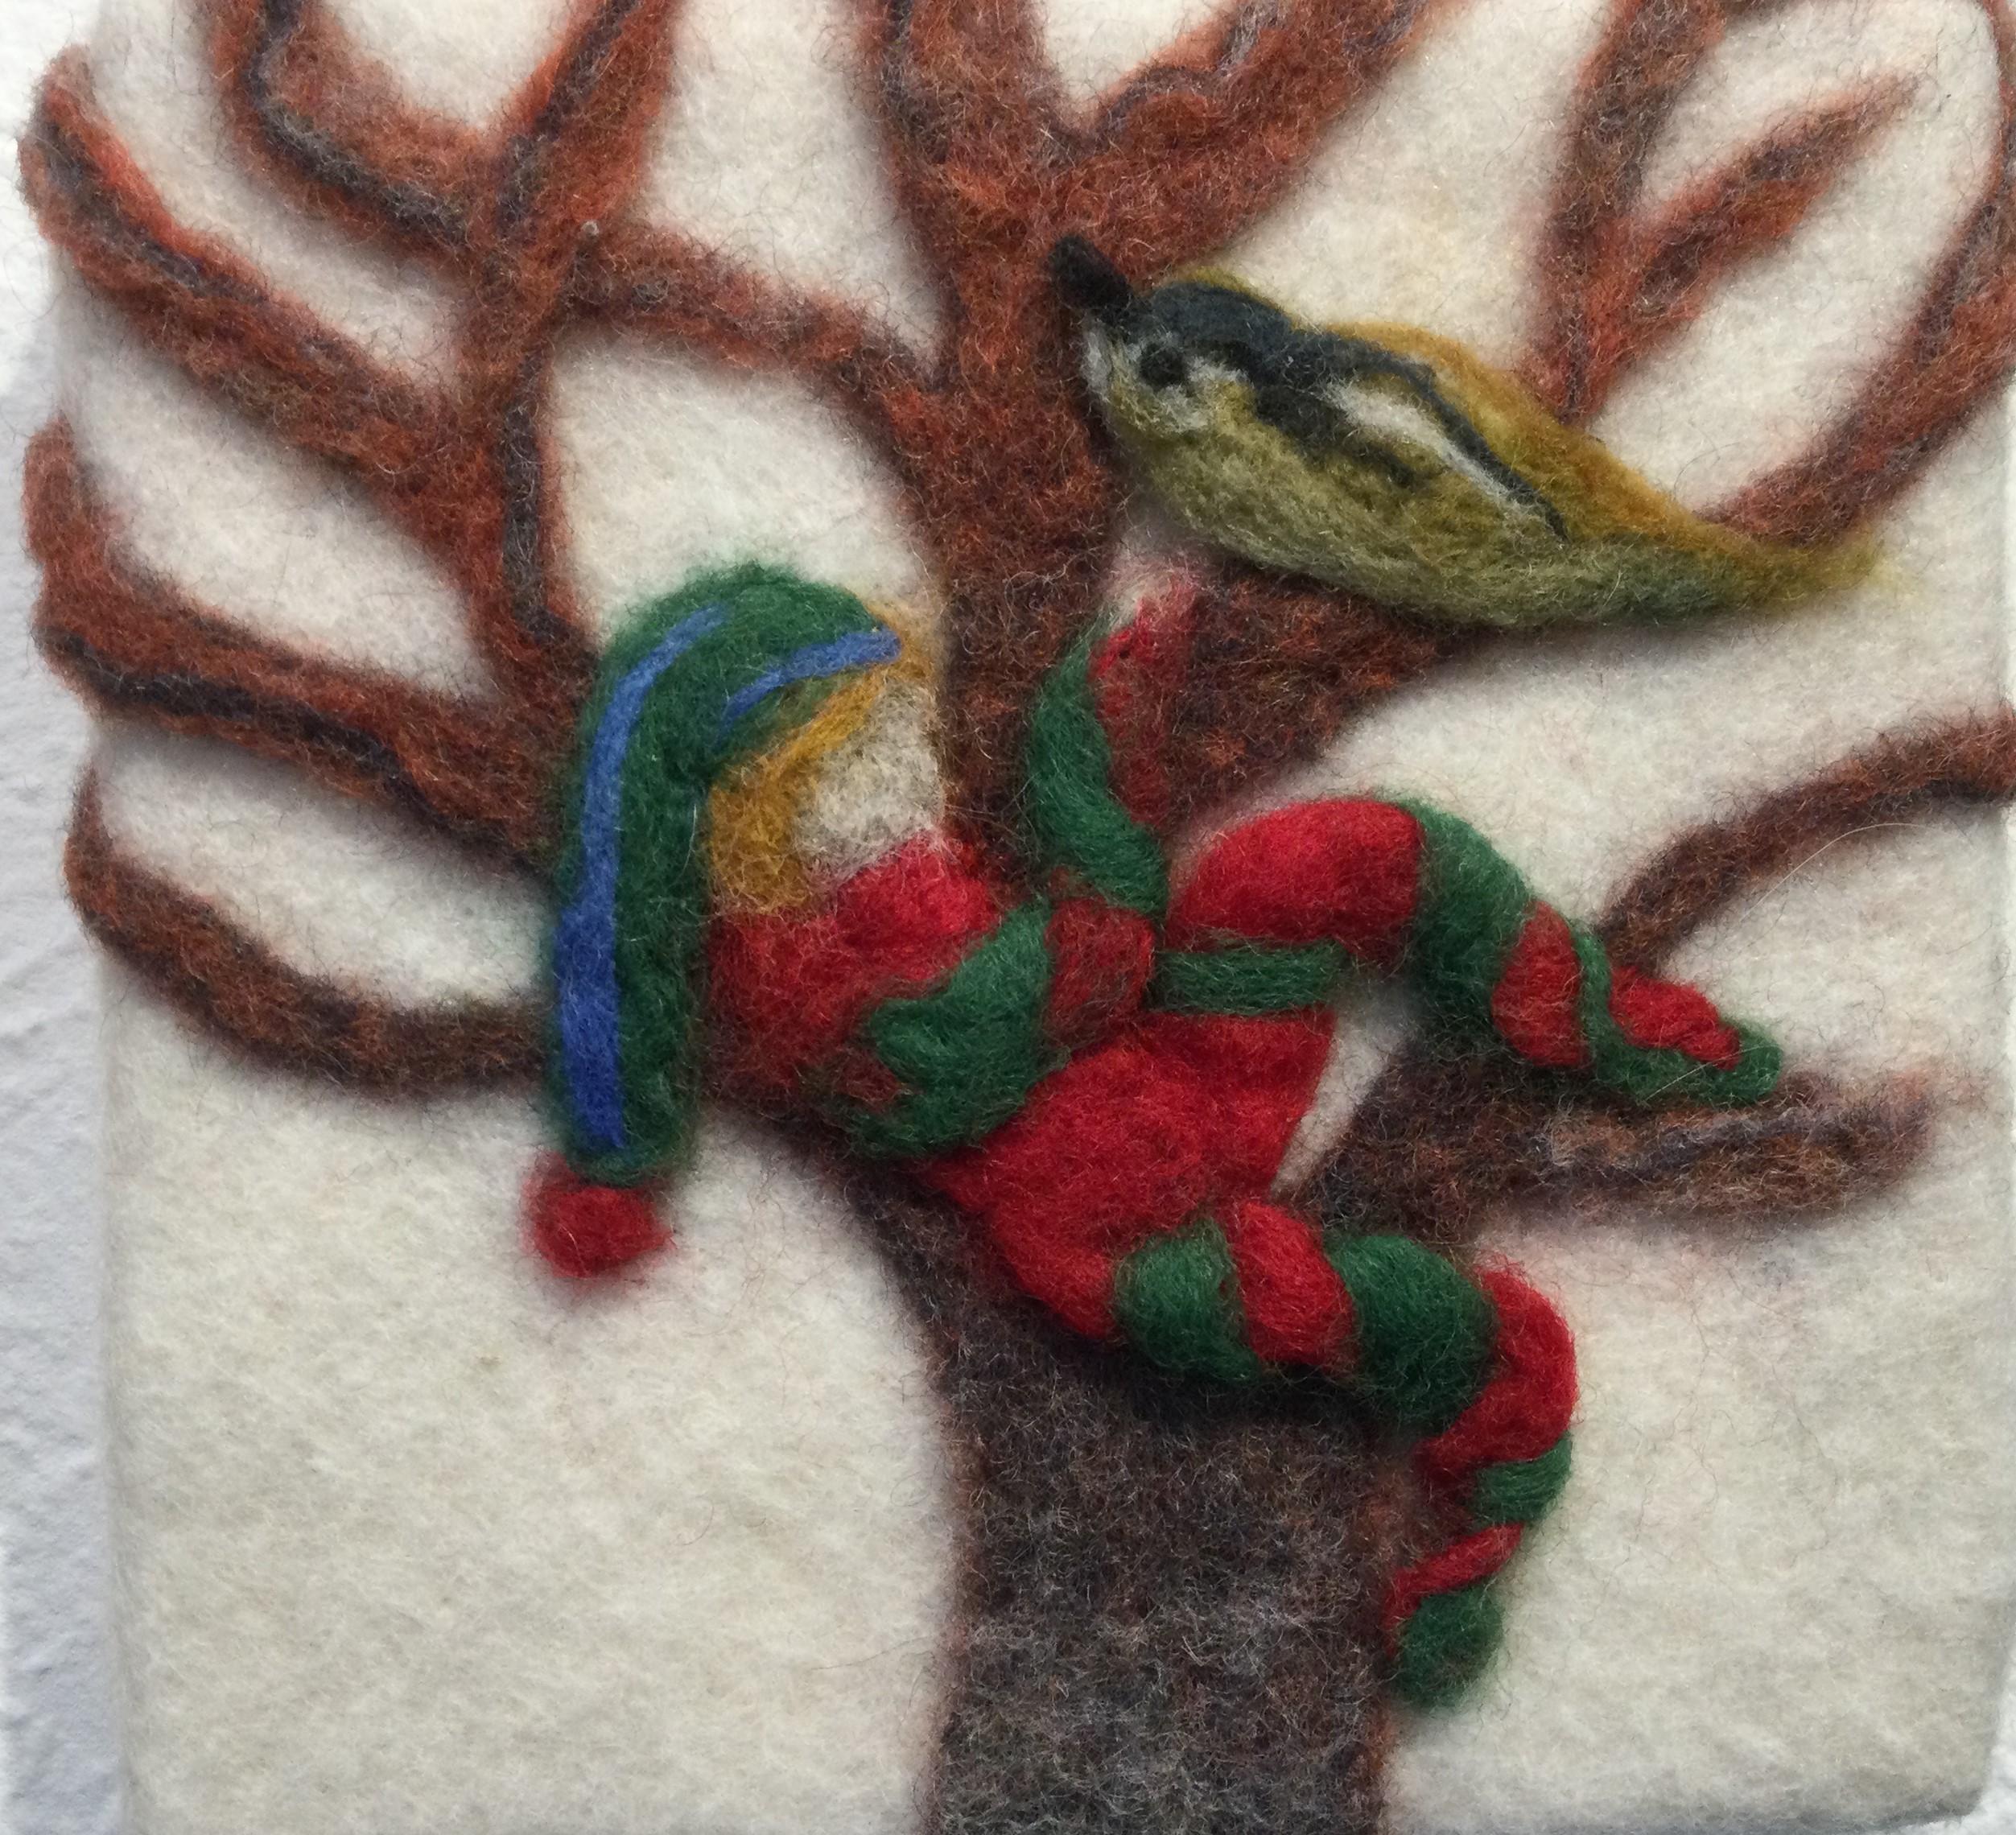 Spot the Elf: A Fun Family Activity, Nov 19 – Dec 19